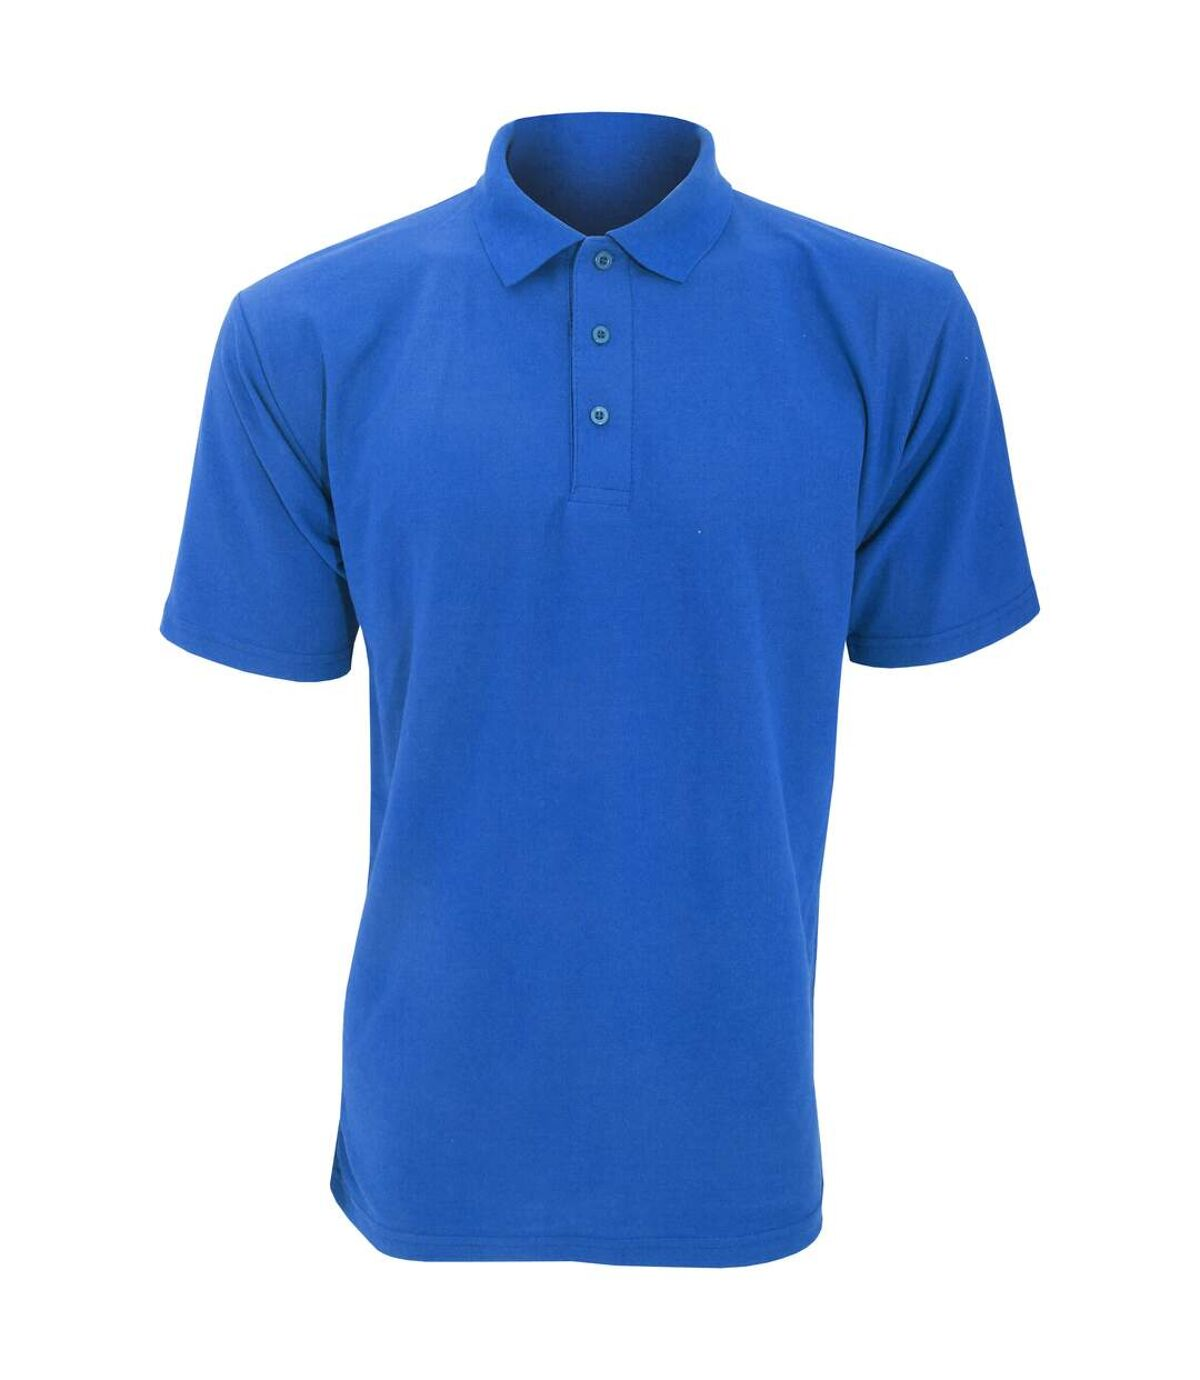 UCC 50/50 Mens Plain Piqué Short Sleeve Polo Shirt (Royal) - UTBC1194